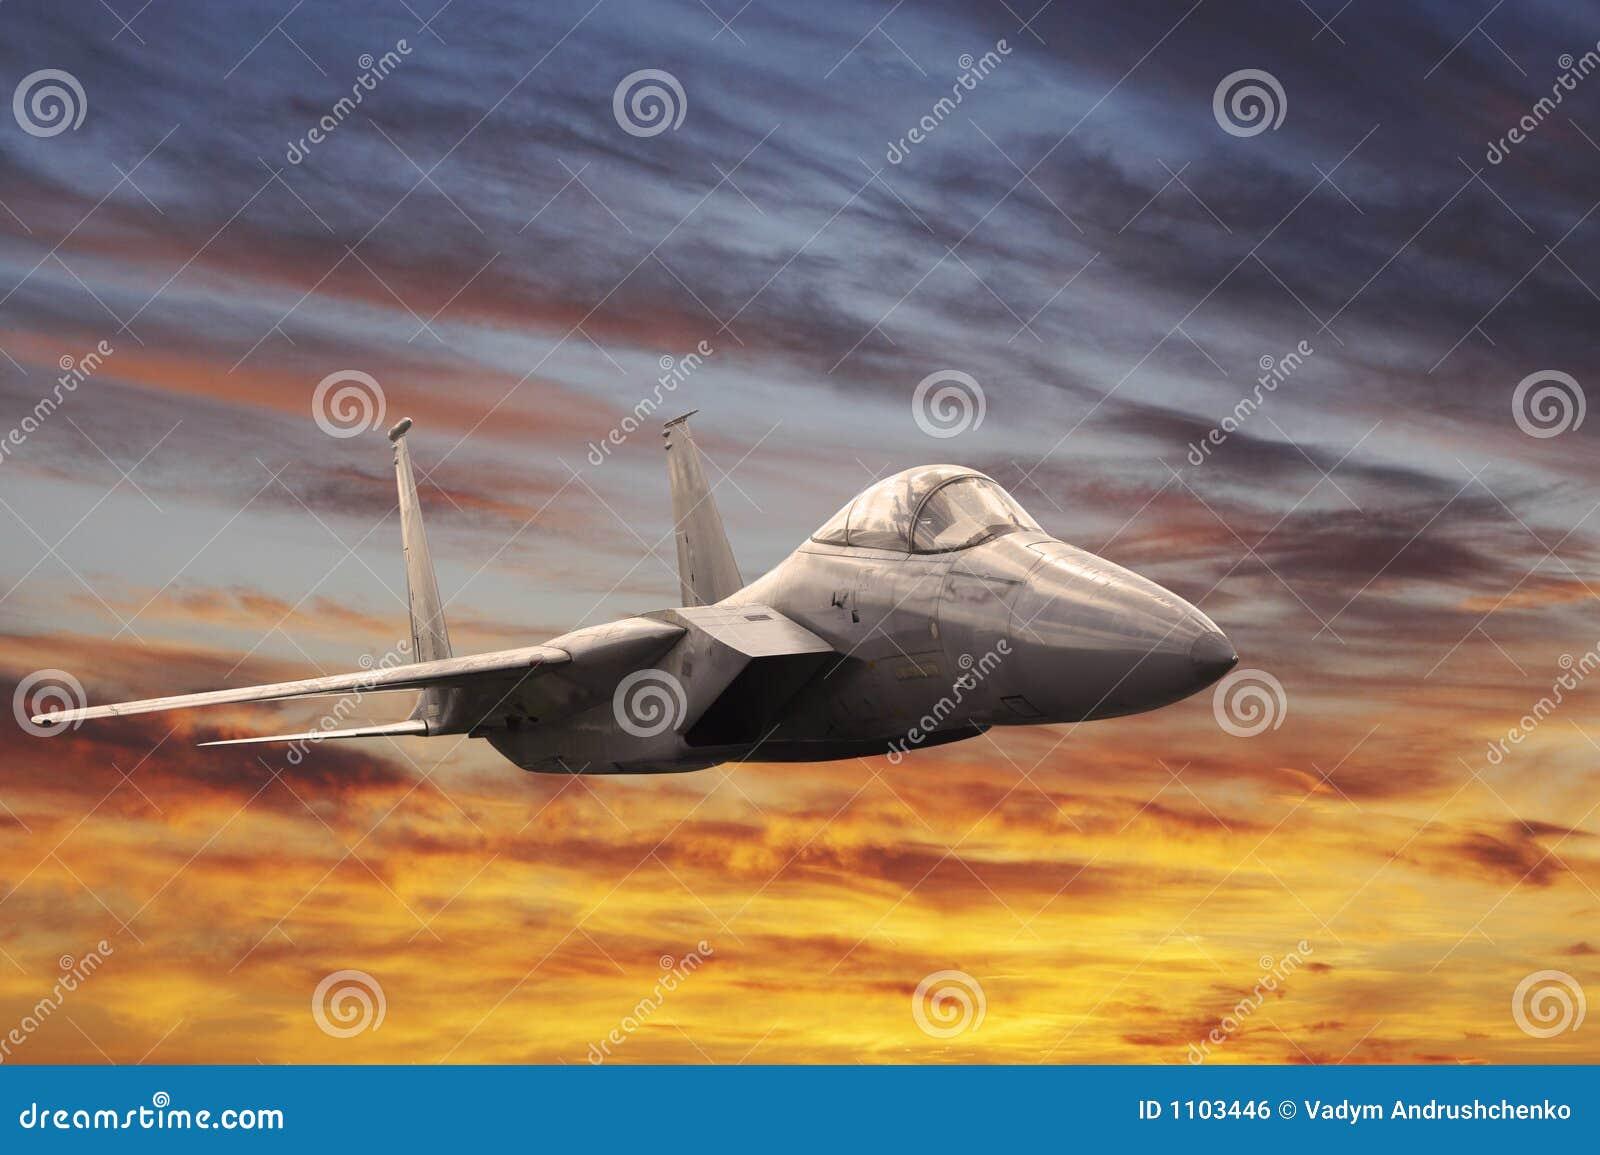 Military aeroplane